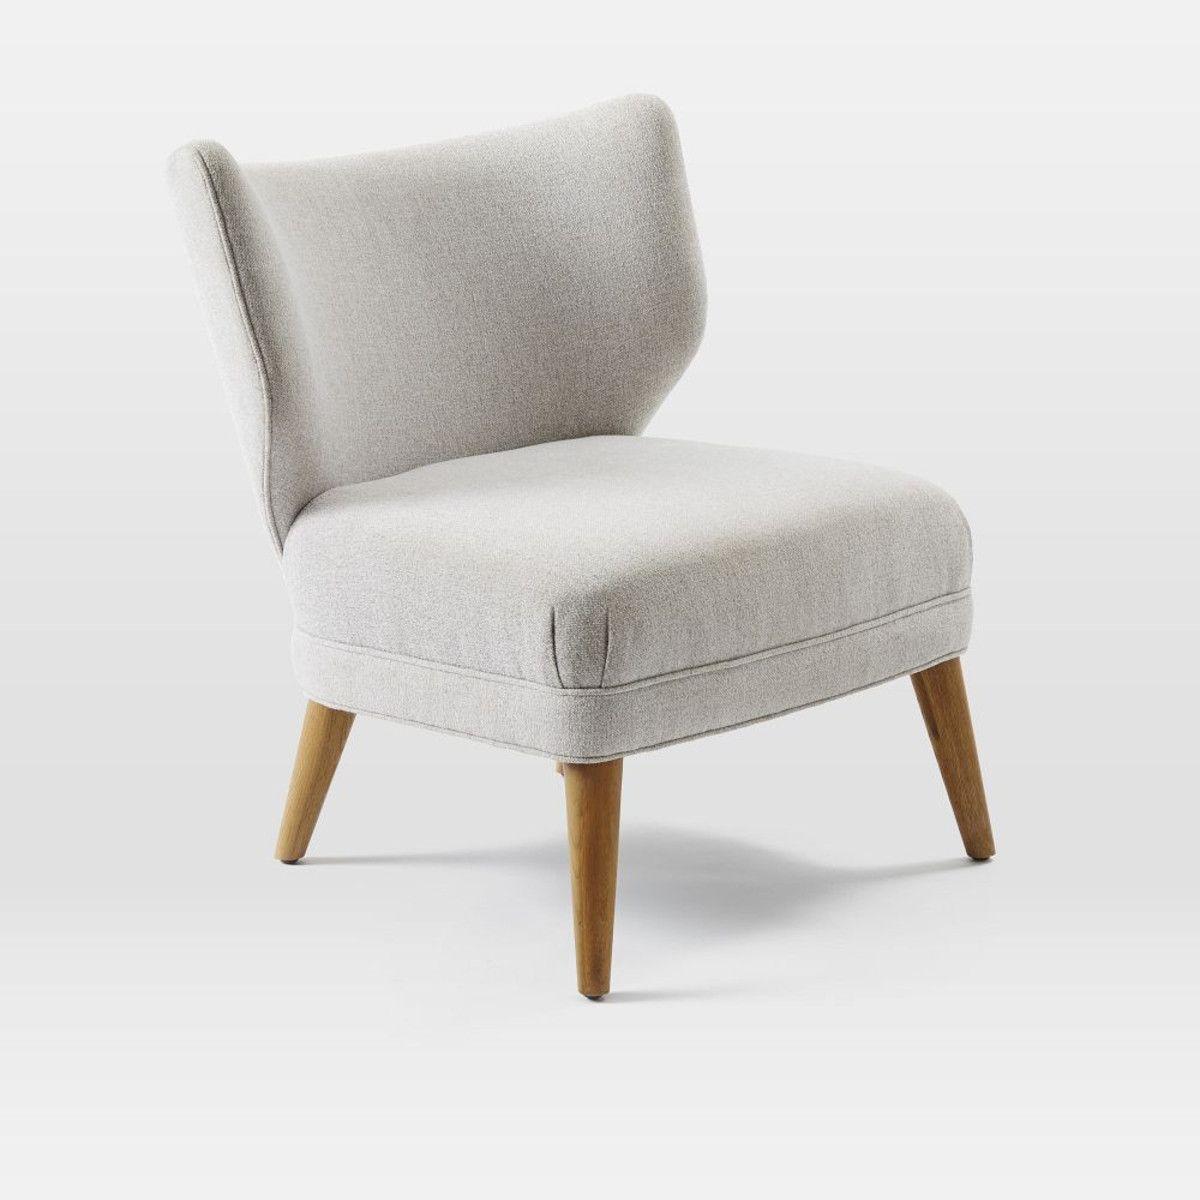 Retro Wing Chair | west elm Australia | Chairs | Pinterest